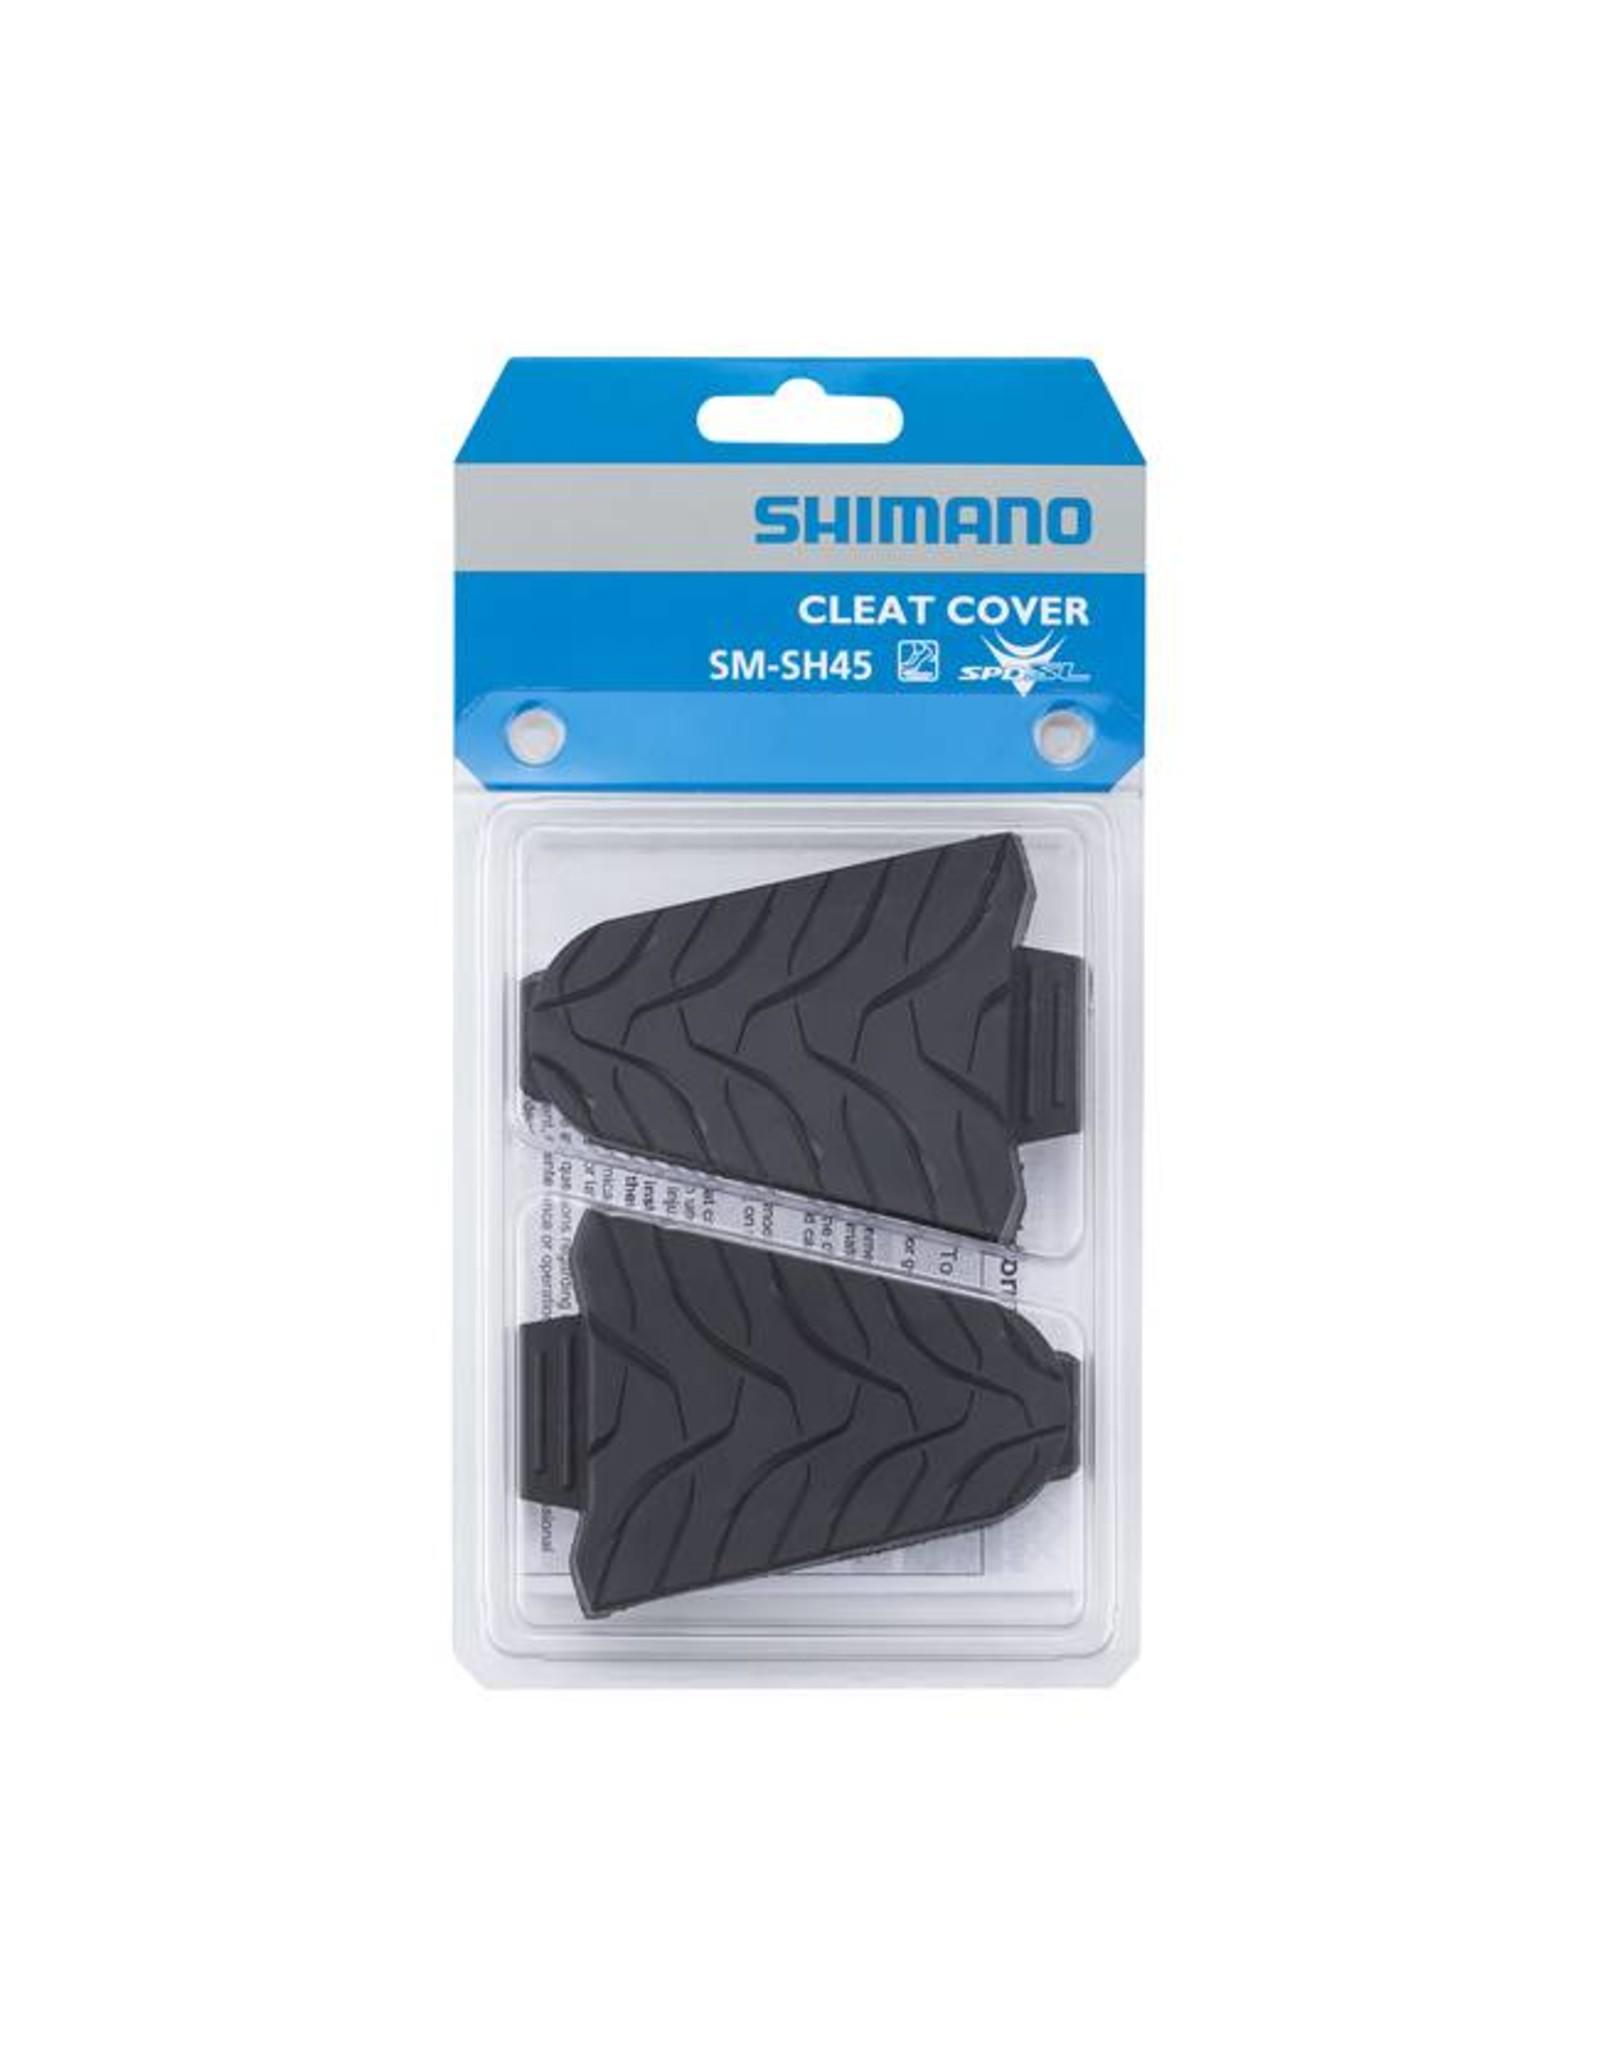 SHIMANO Shimano SM-SH45 SPD-SL Cleat Covers